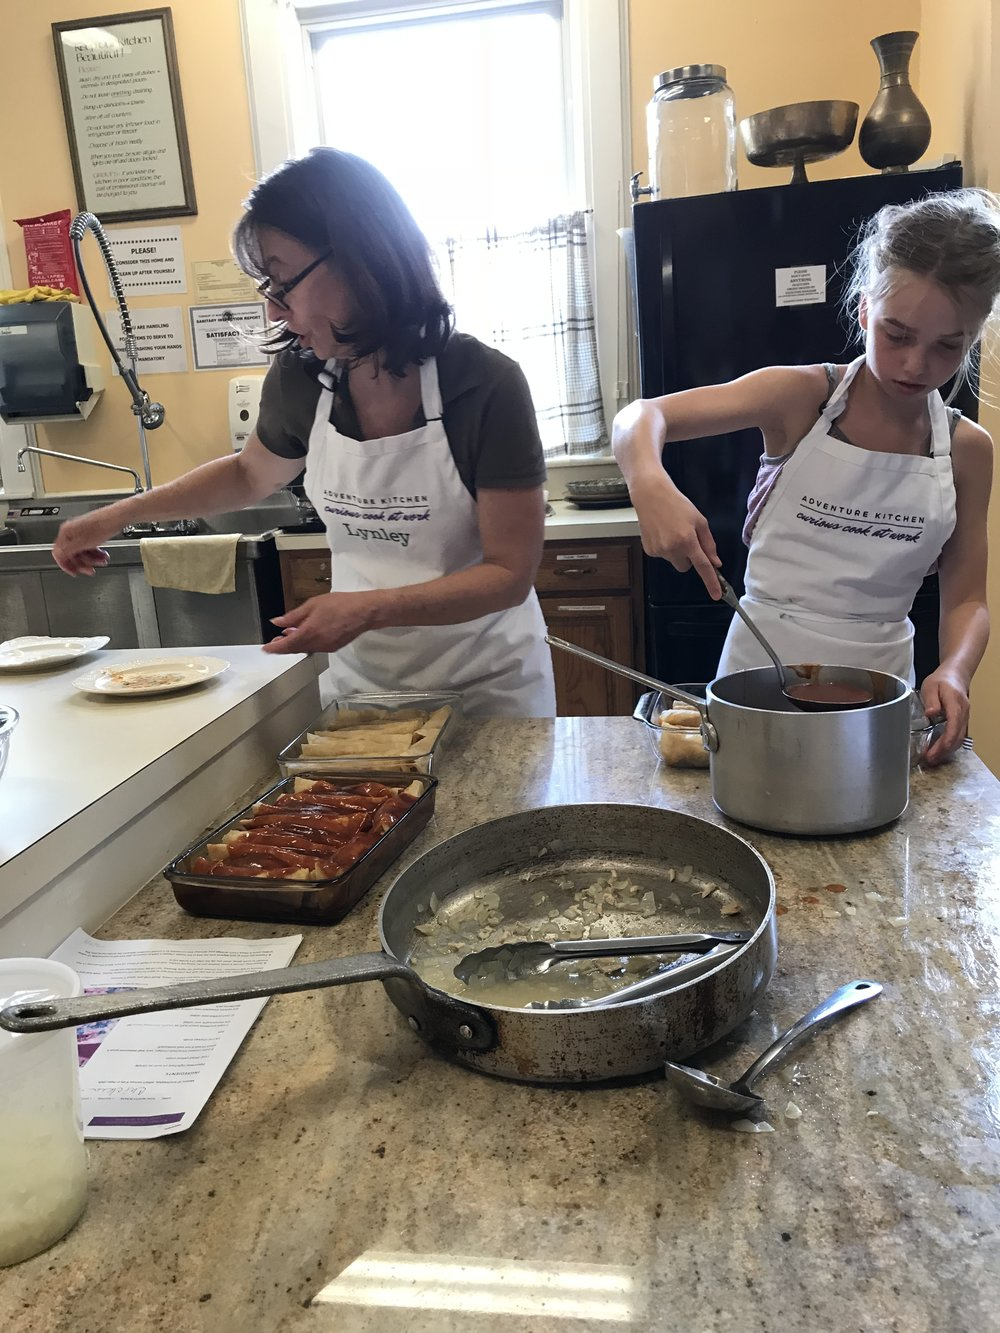 Prepping enchiladas to go into the oven